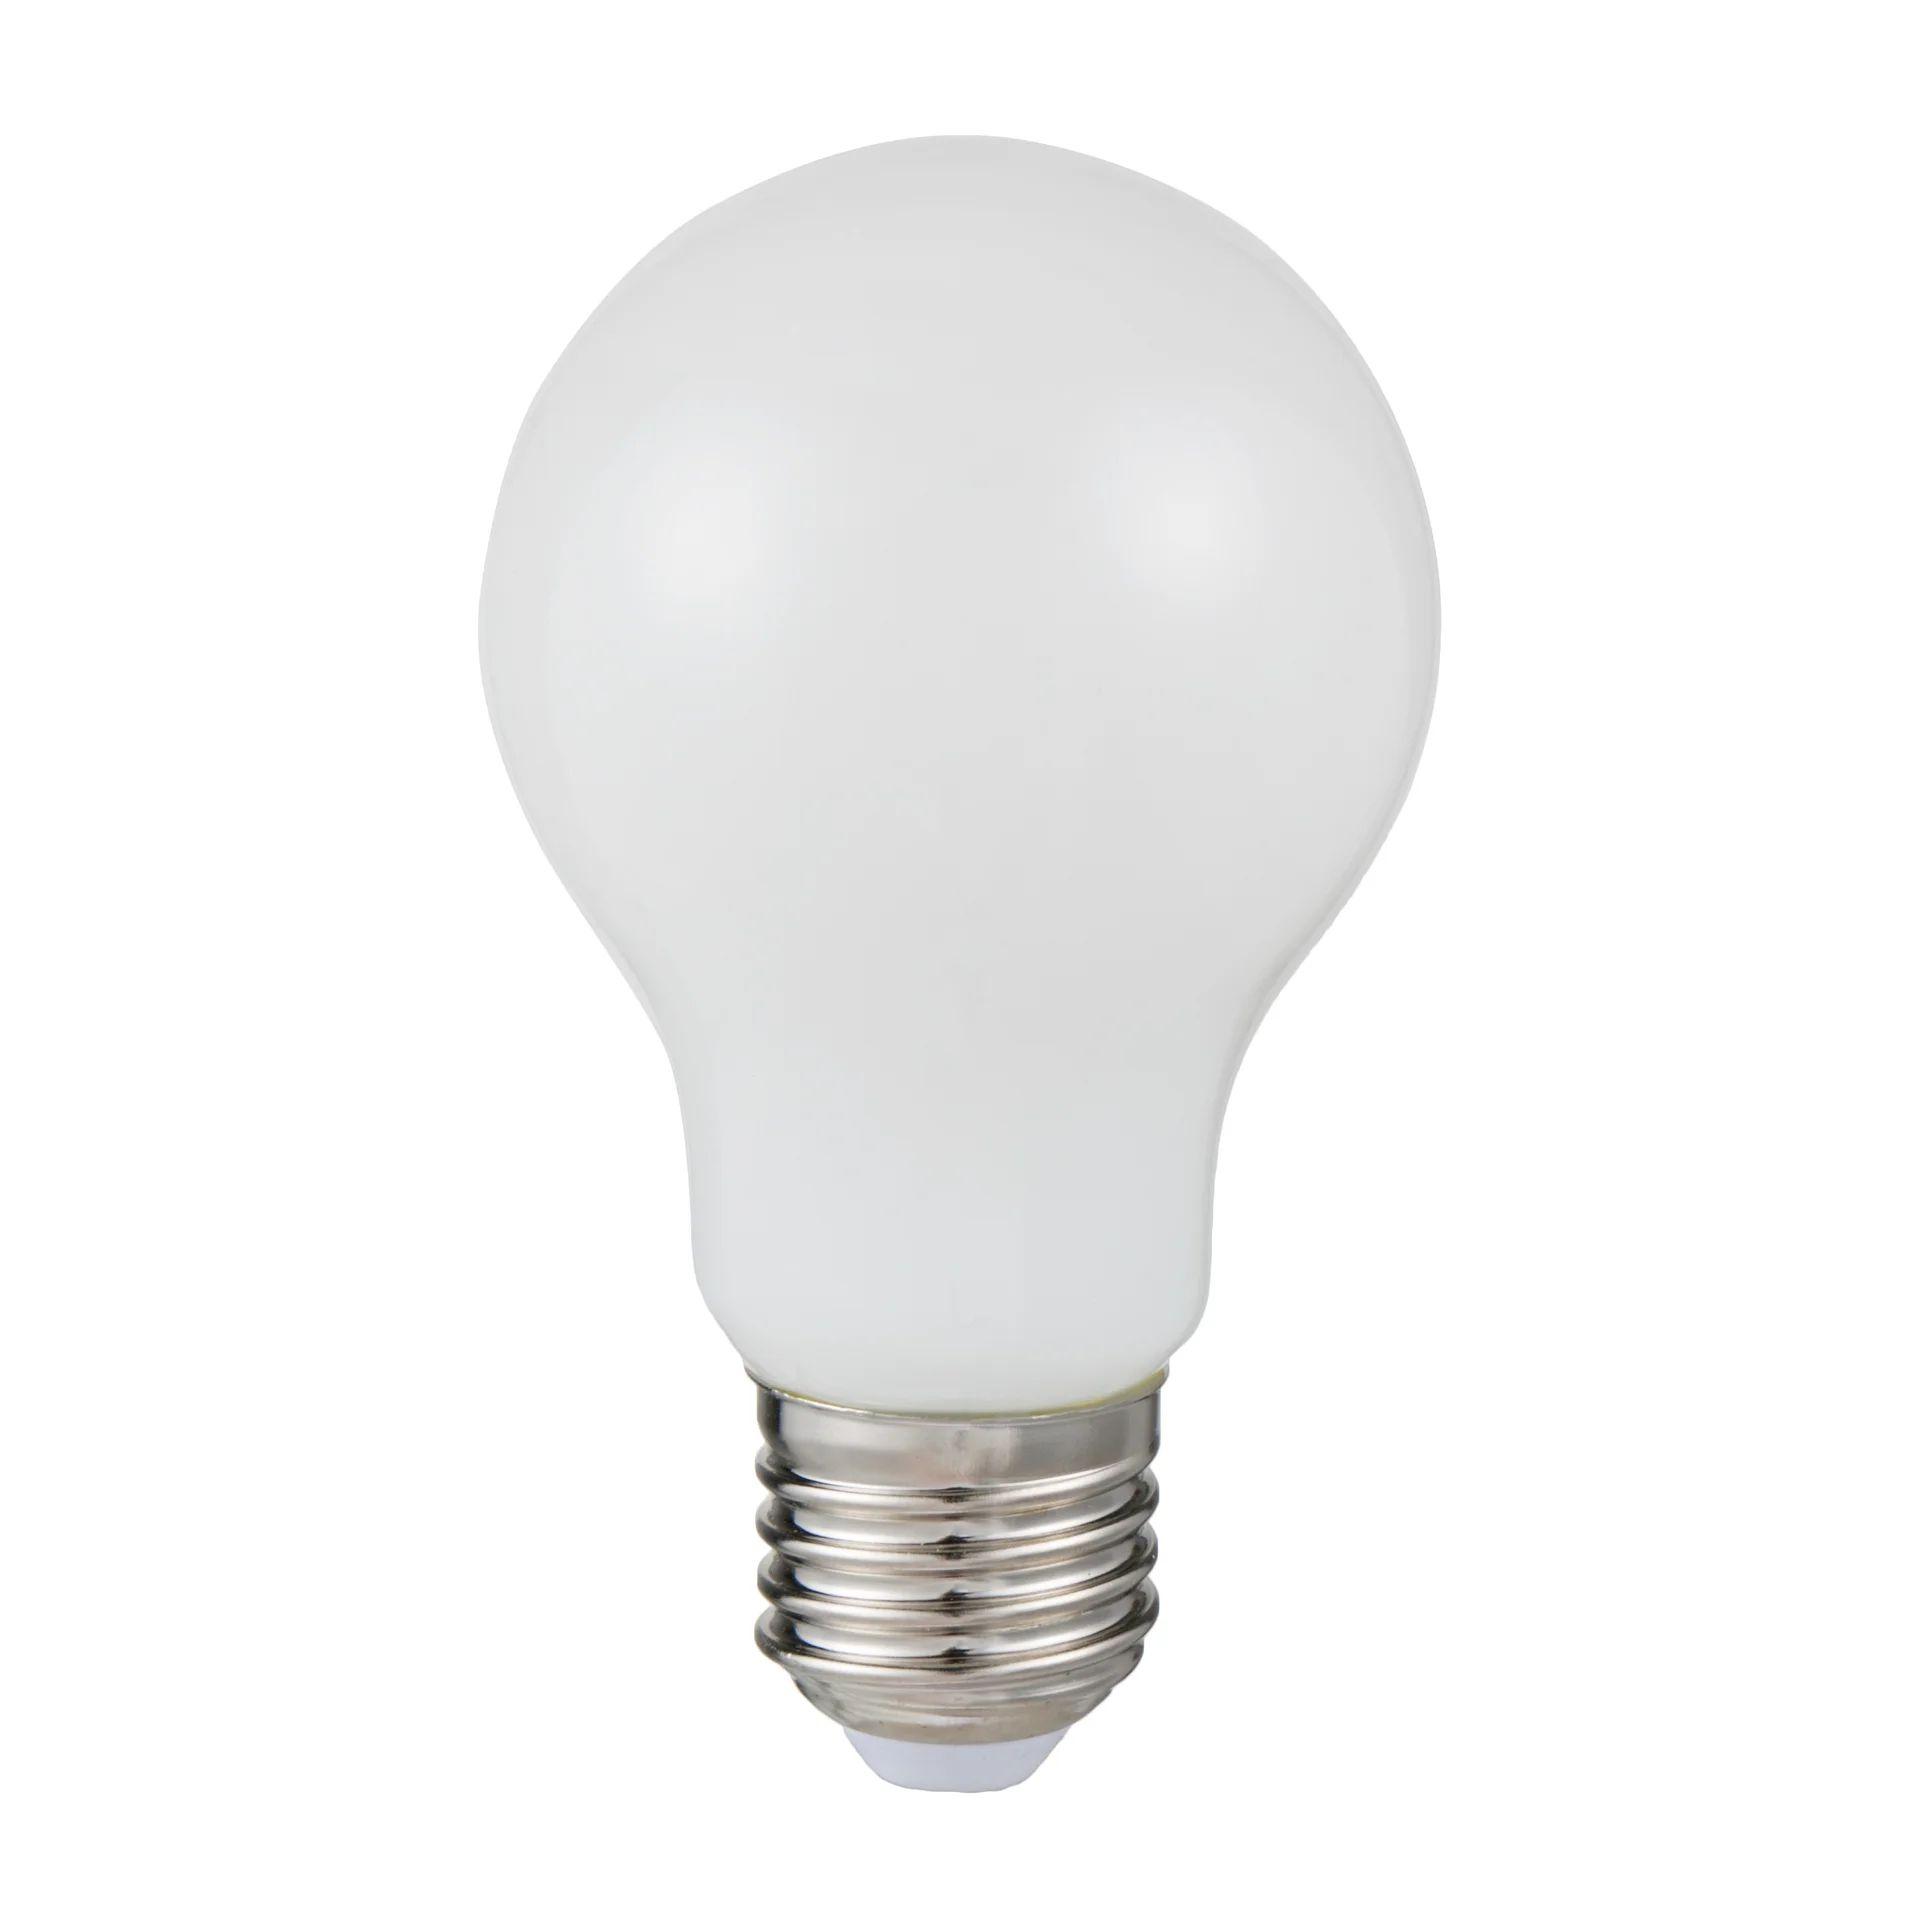 Ampoule Led A Filament Opaque Standard E27 806lm 60w Blanc 2700k Lexman Leroy Merlin